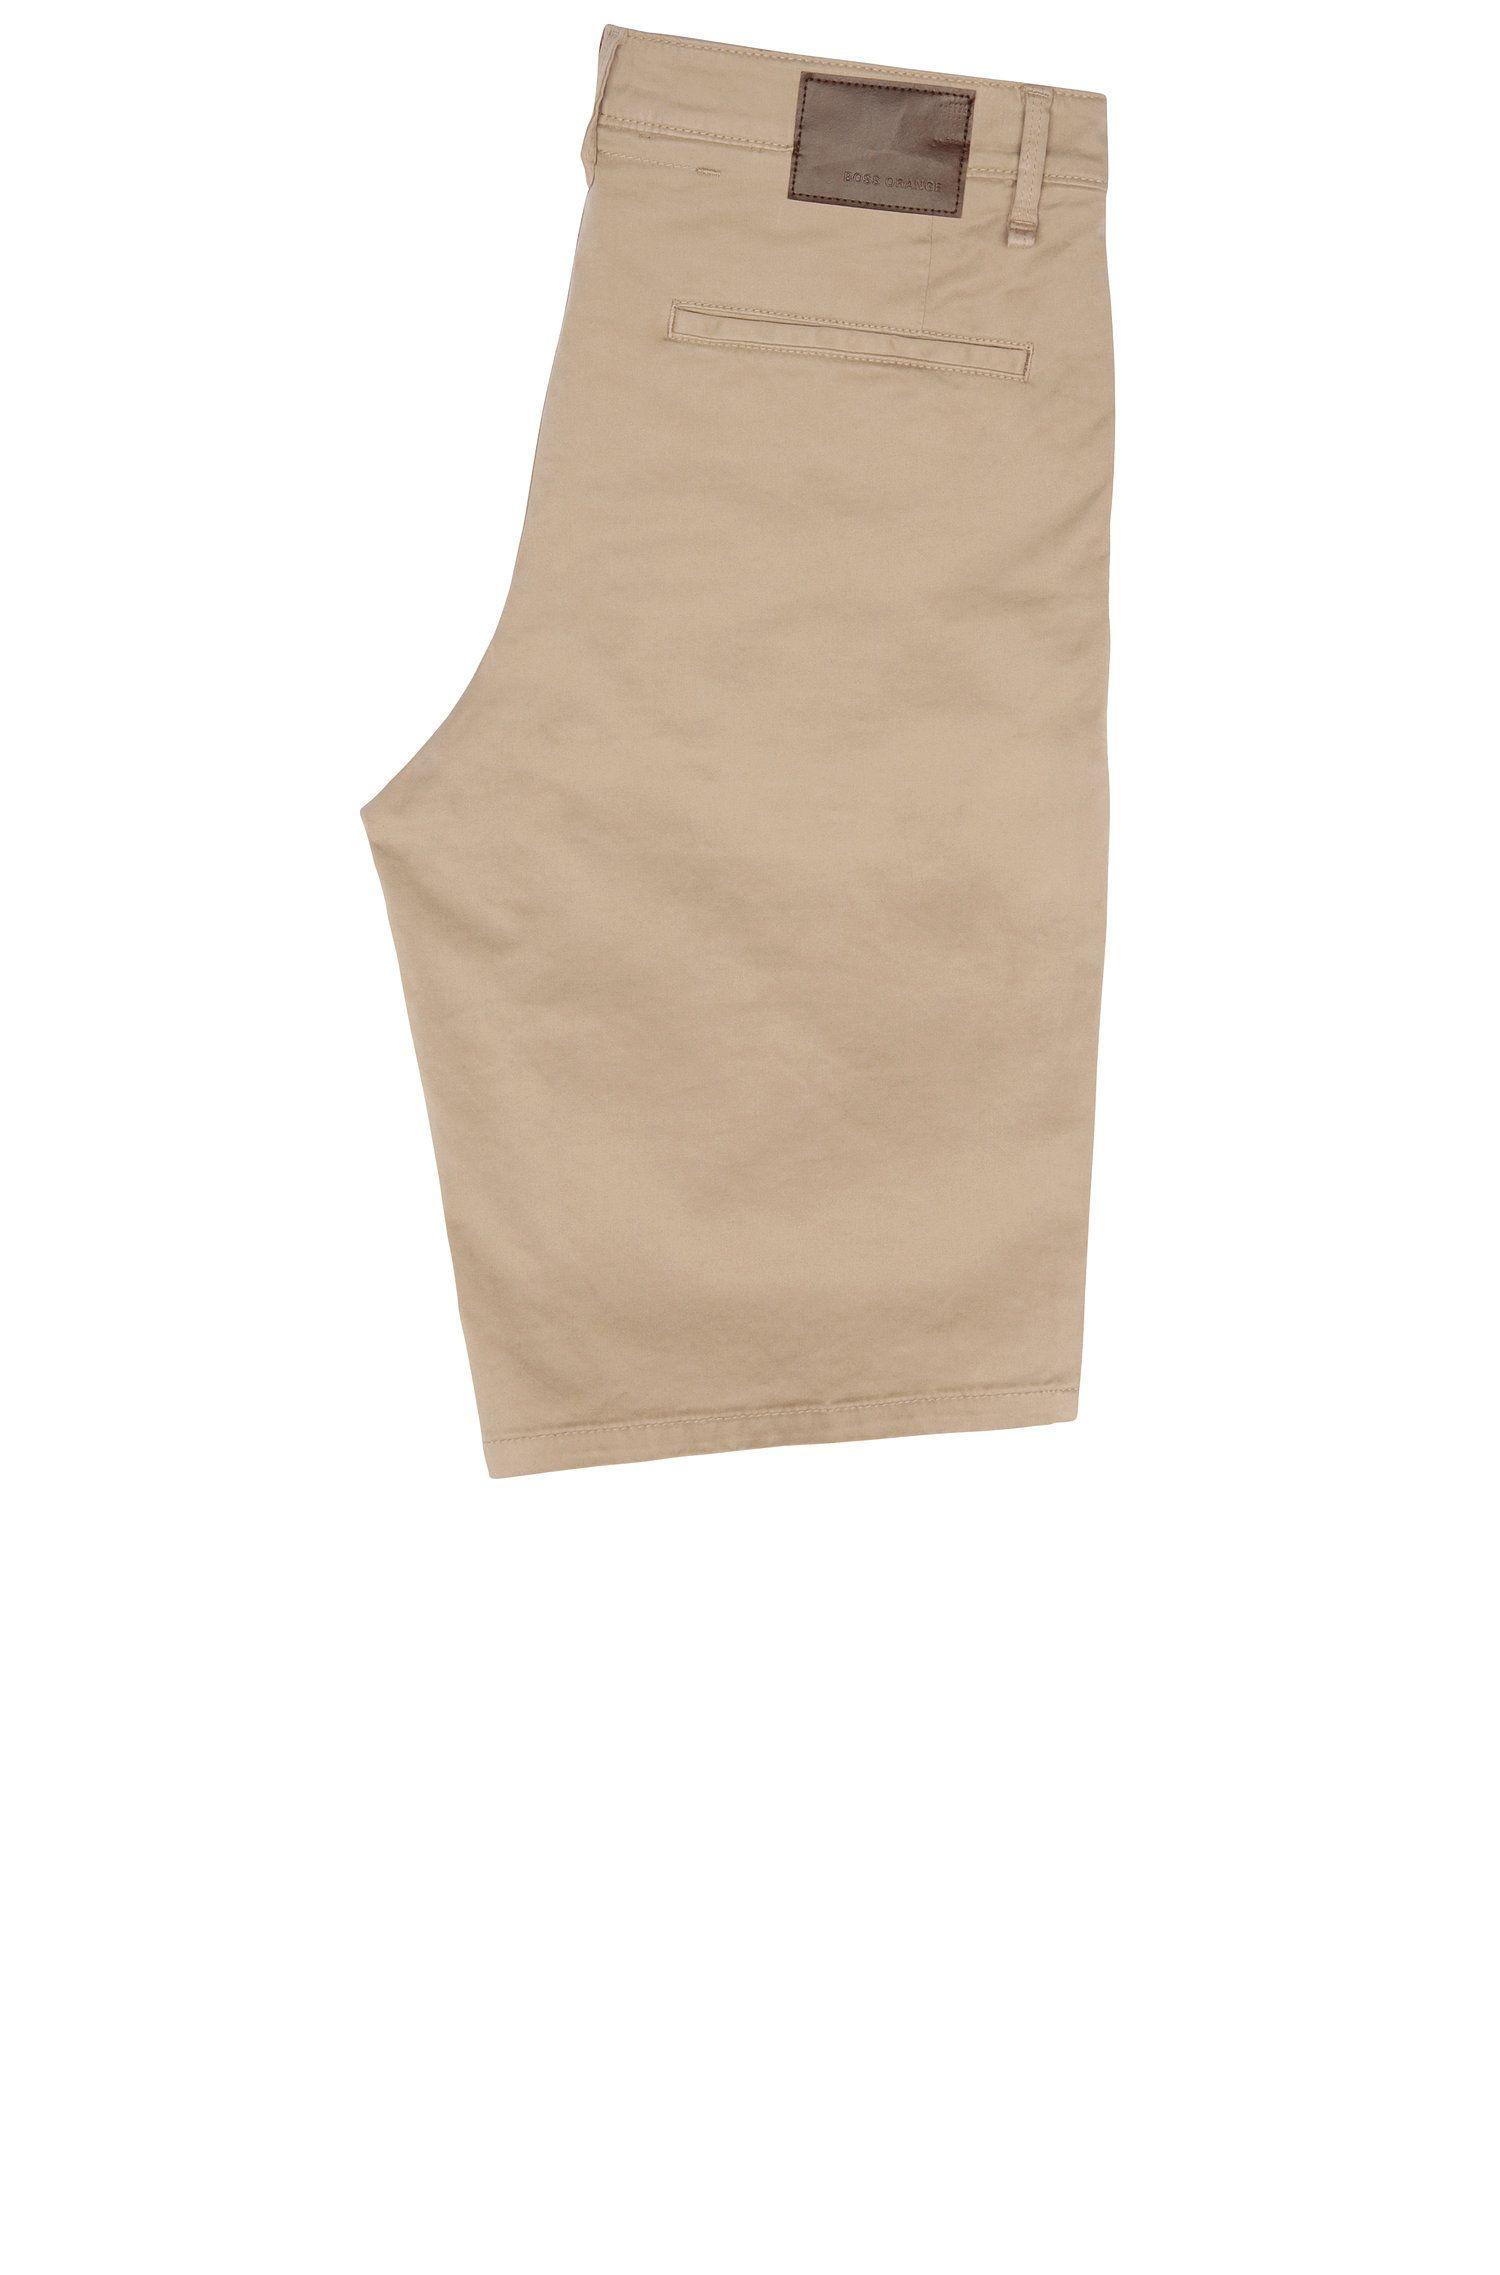 Stretch Cotton Short, Slim Fit | Schino Slim Shorts D